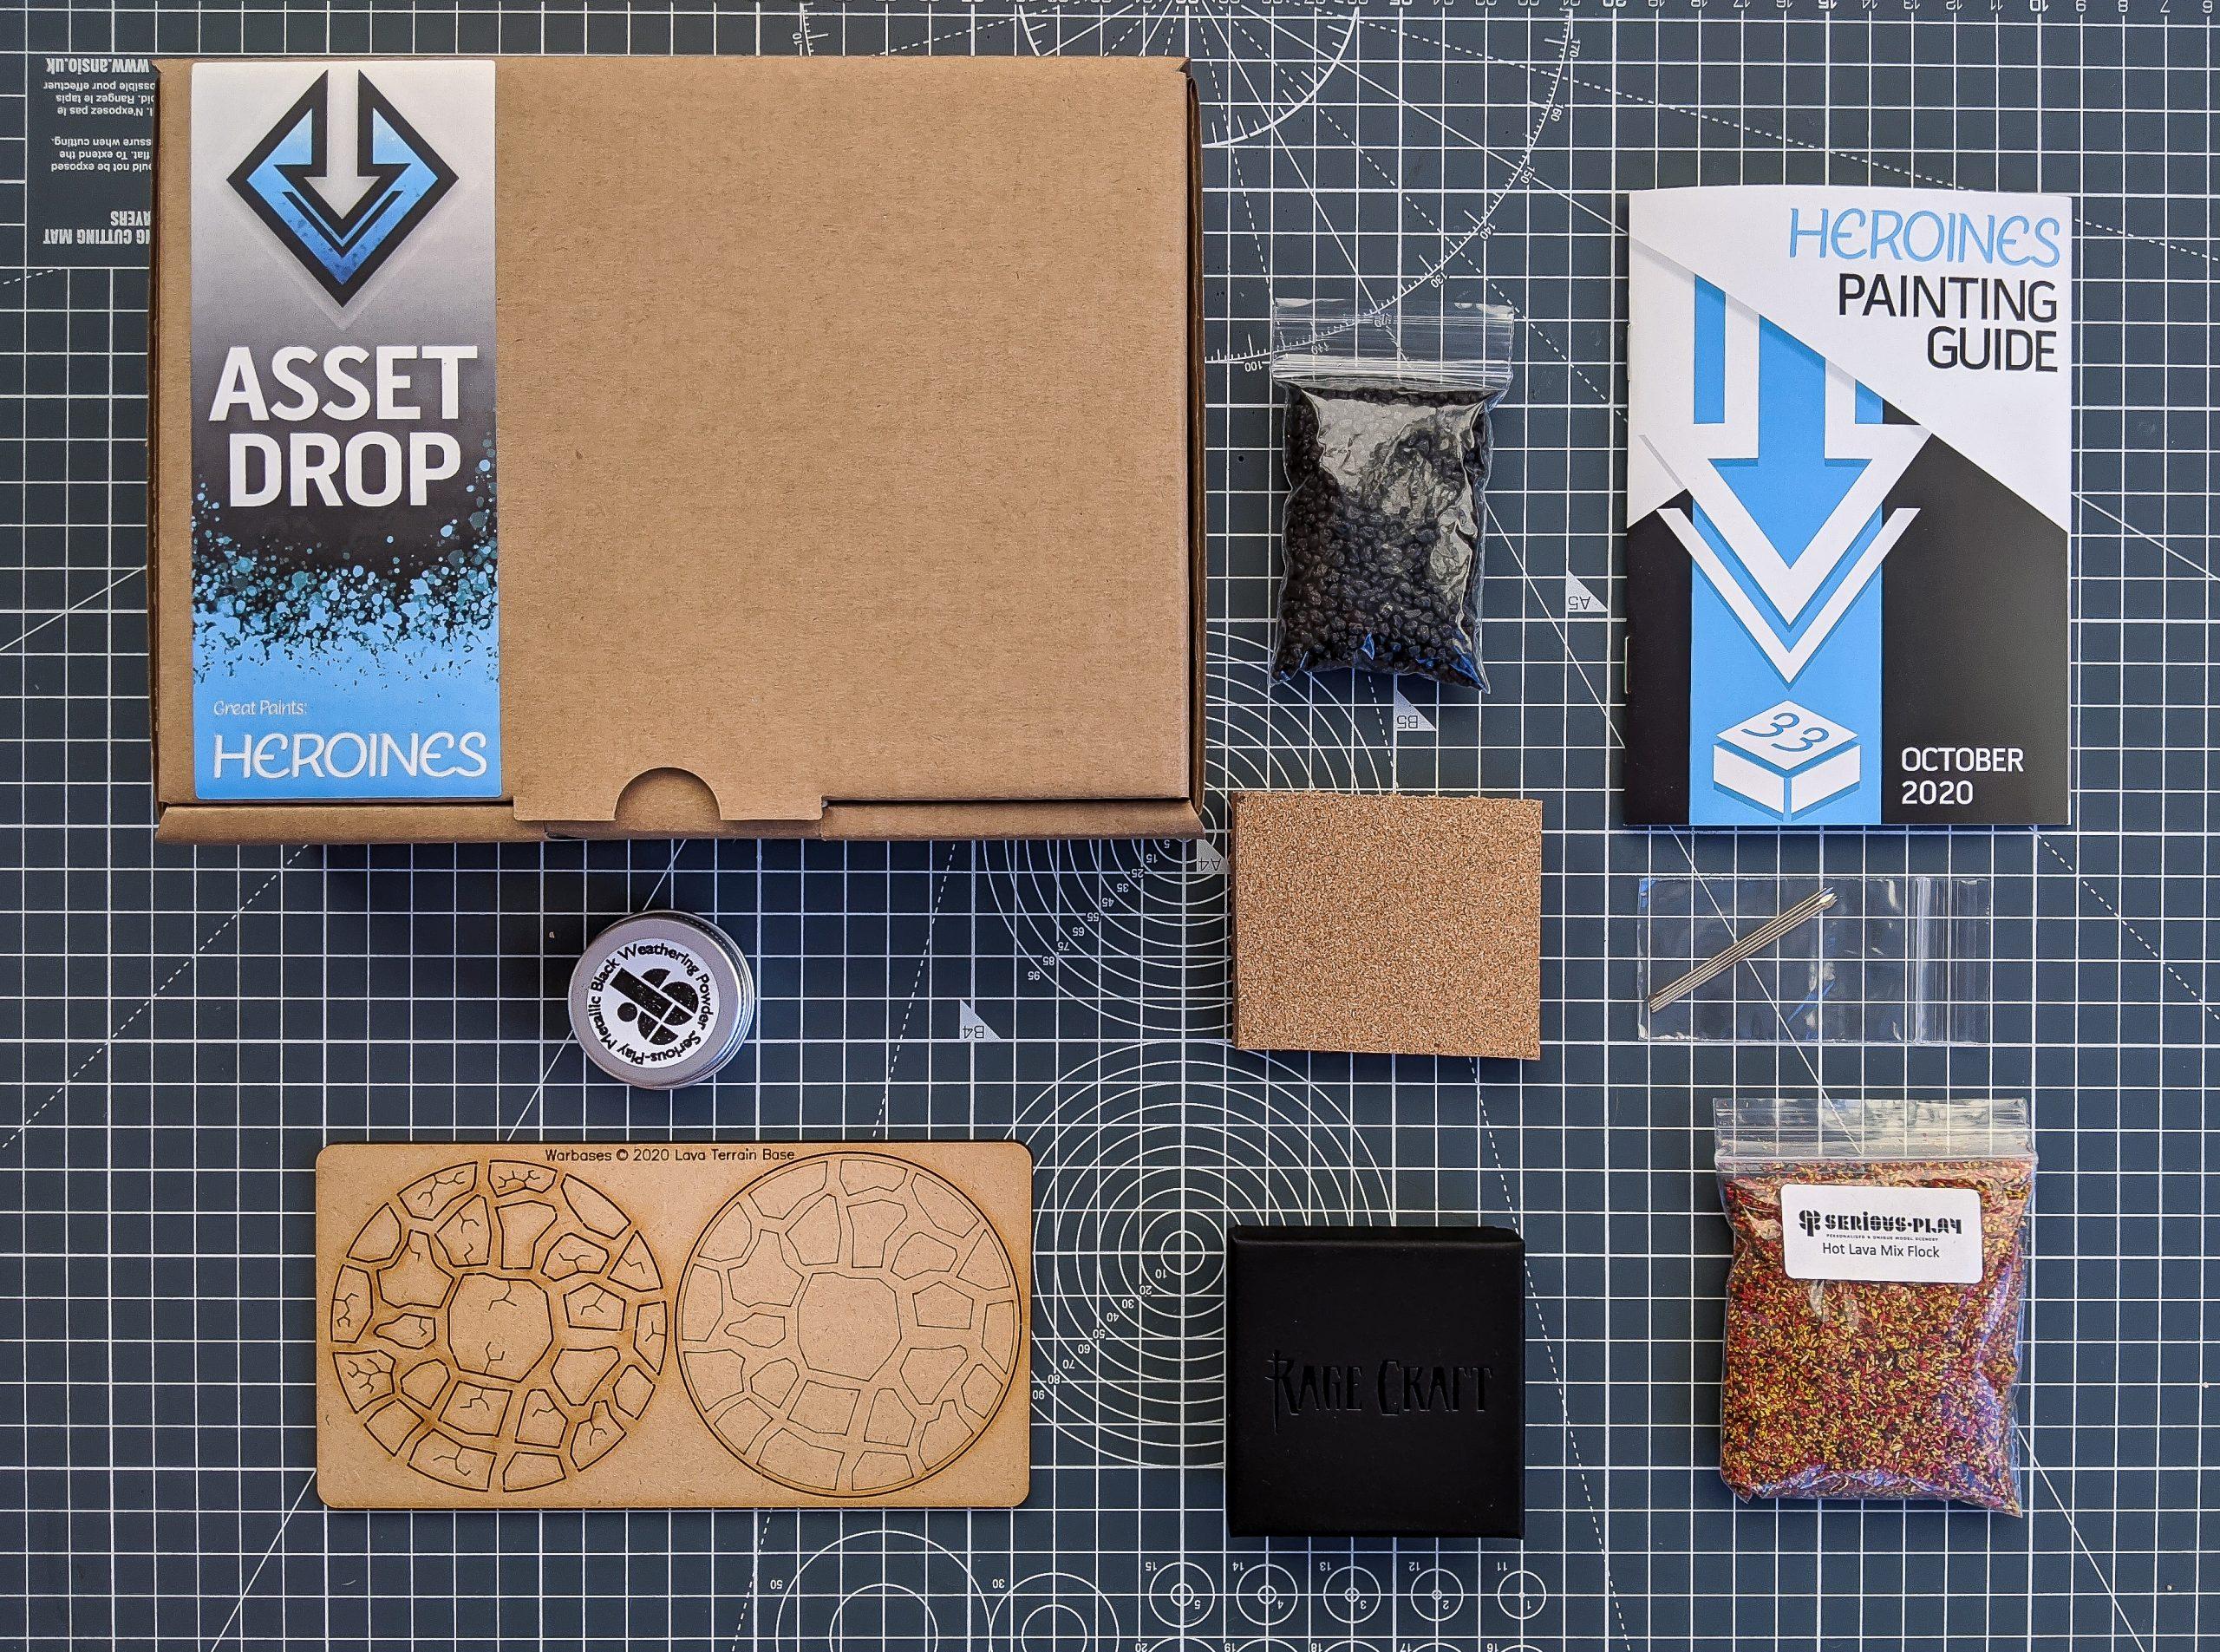 Asset Drop heroines box oct